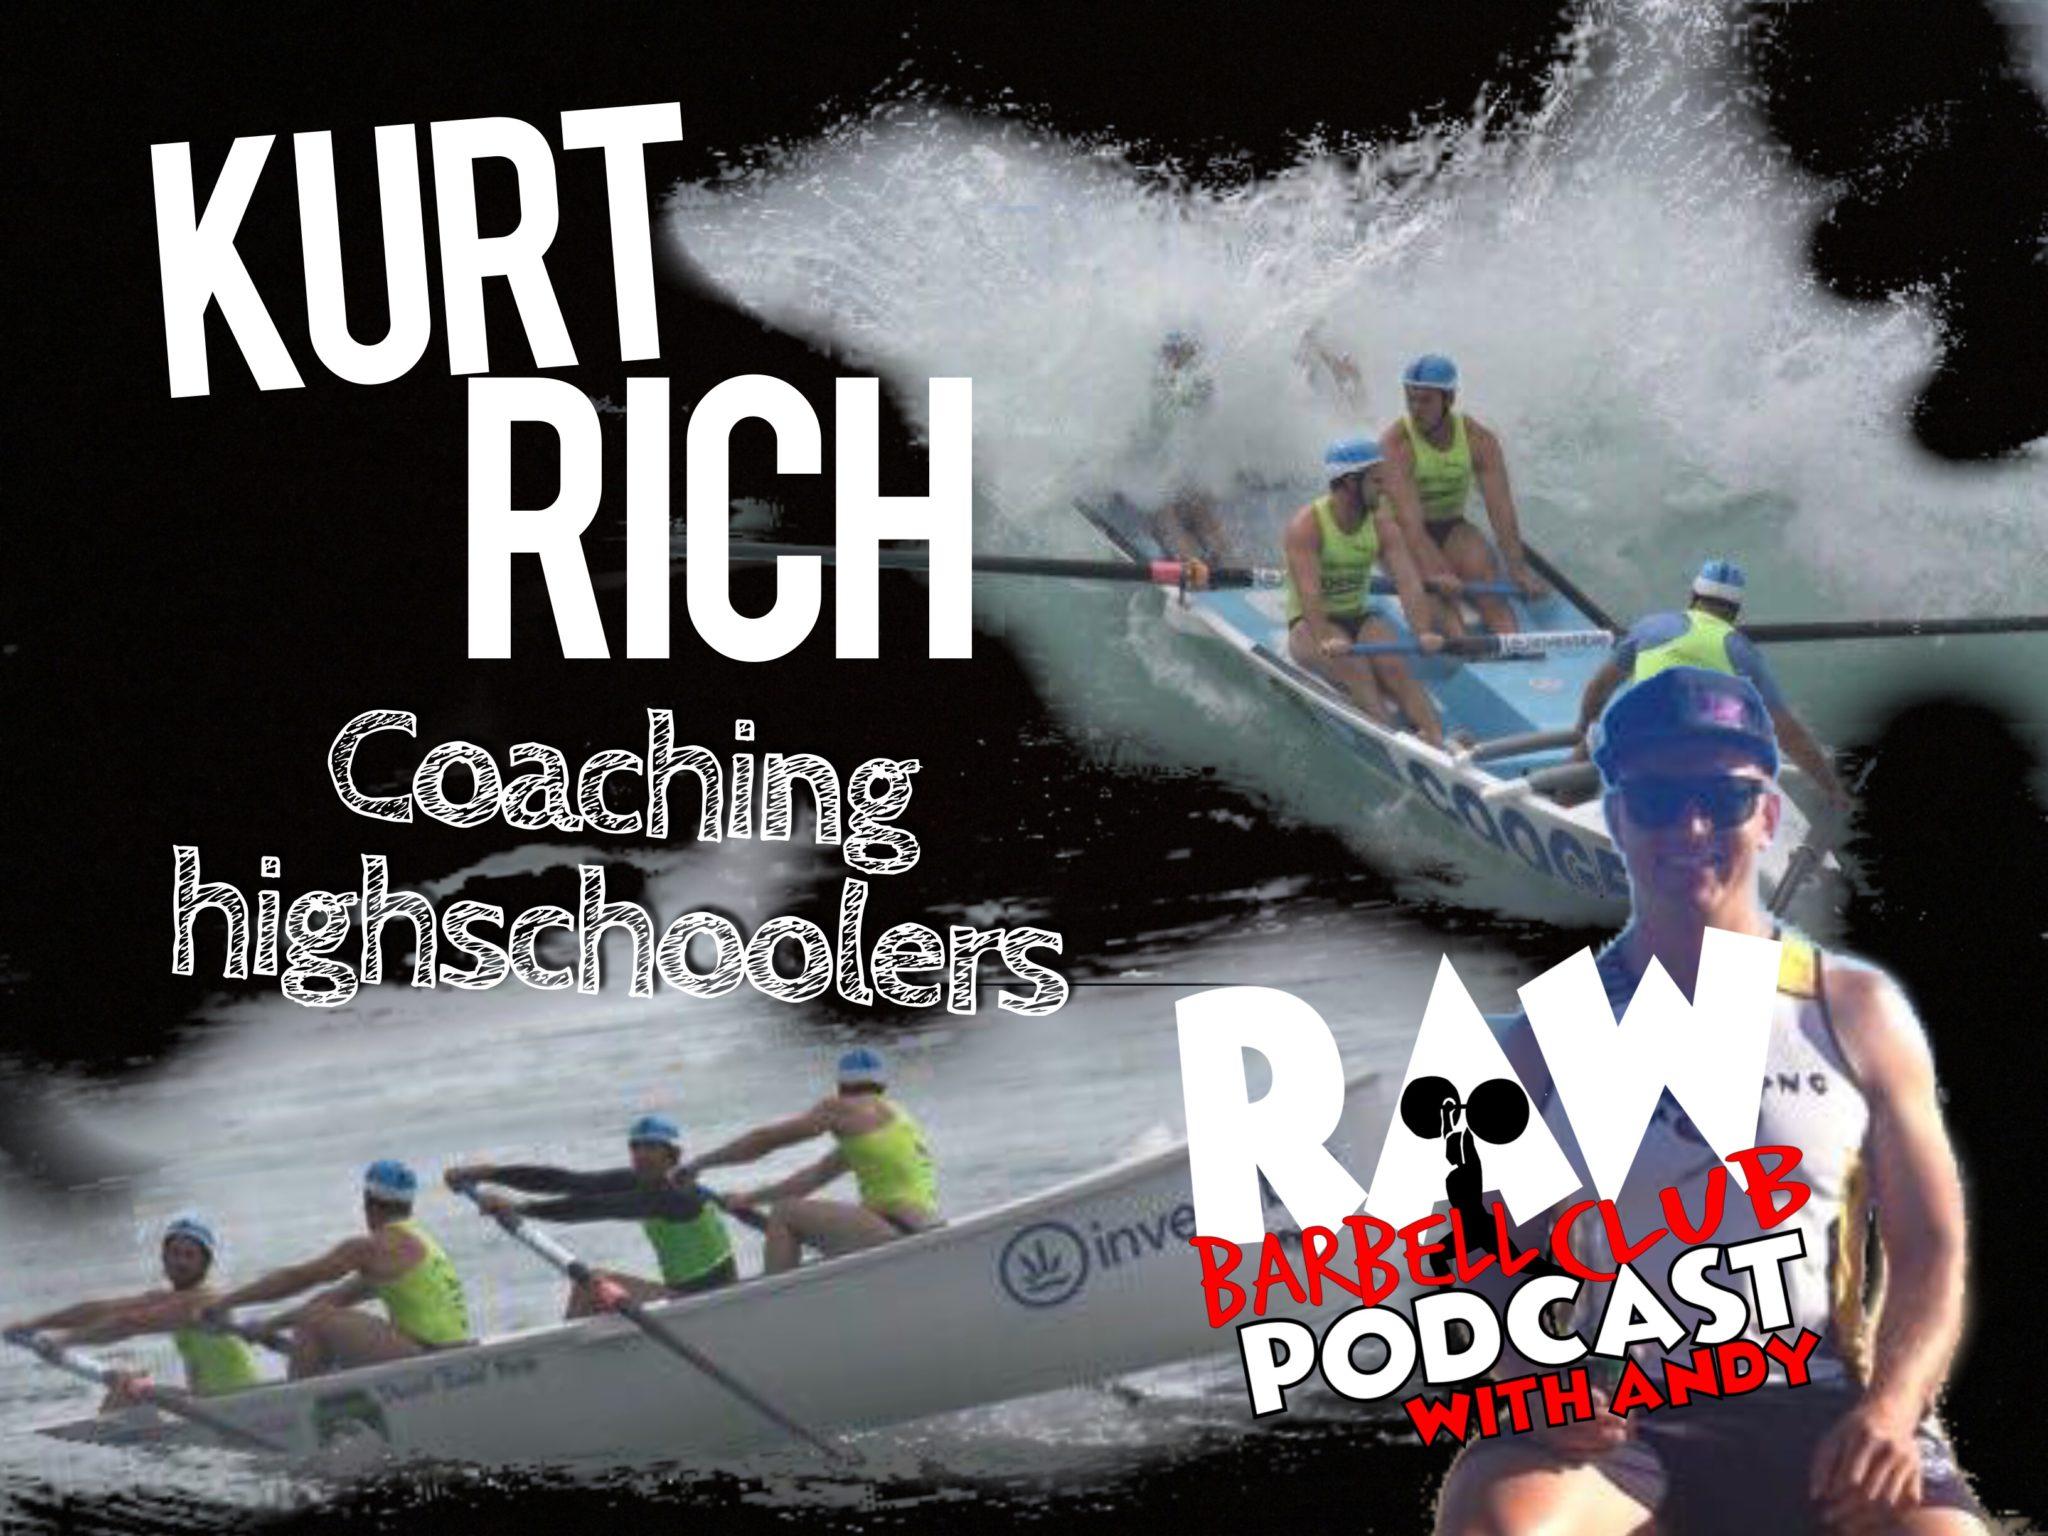 Coaching High Schoolers with Kurt Rich